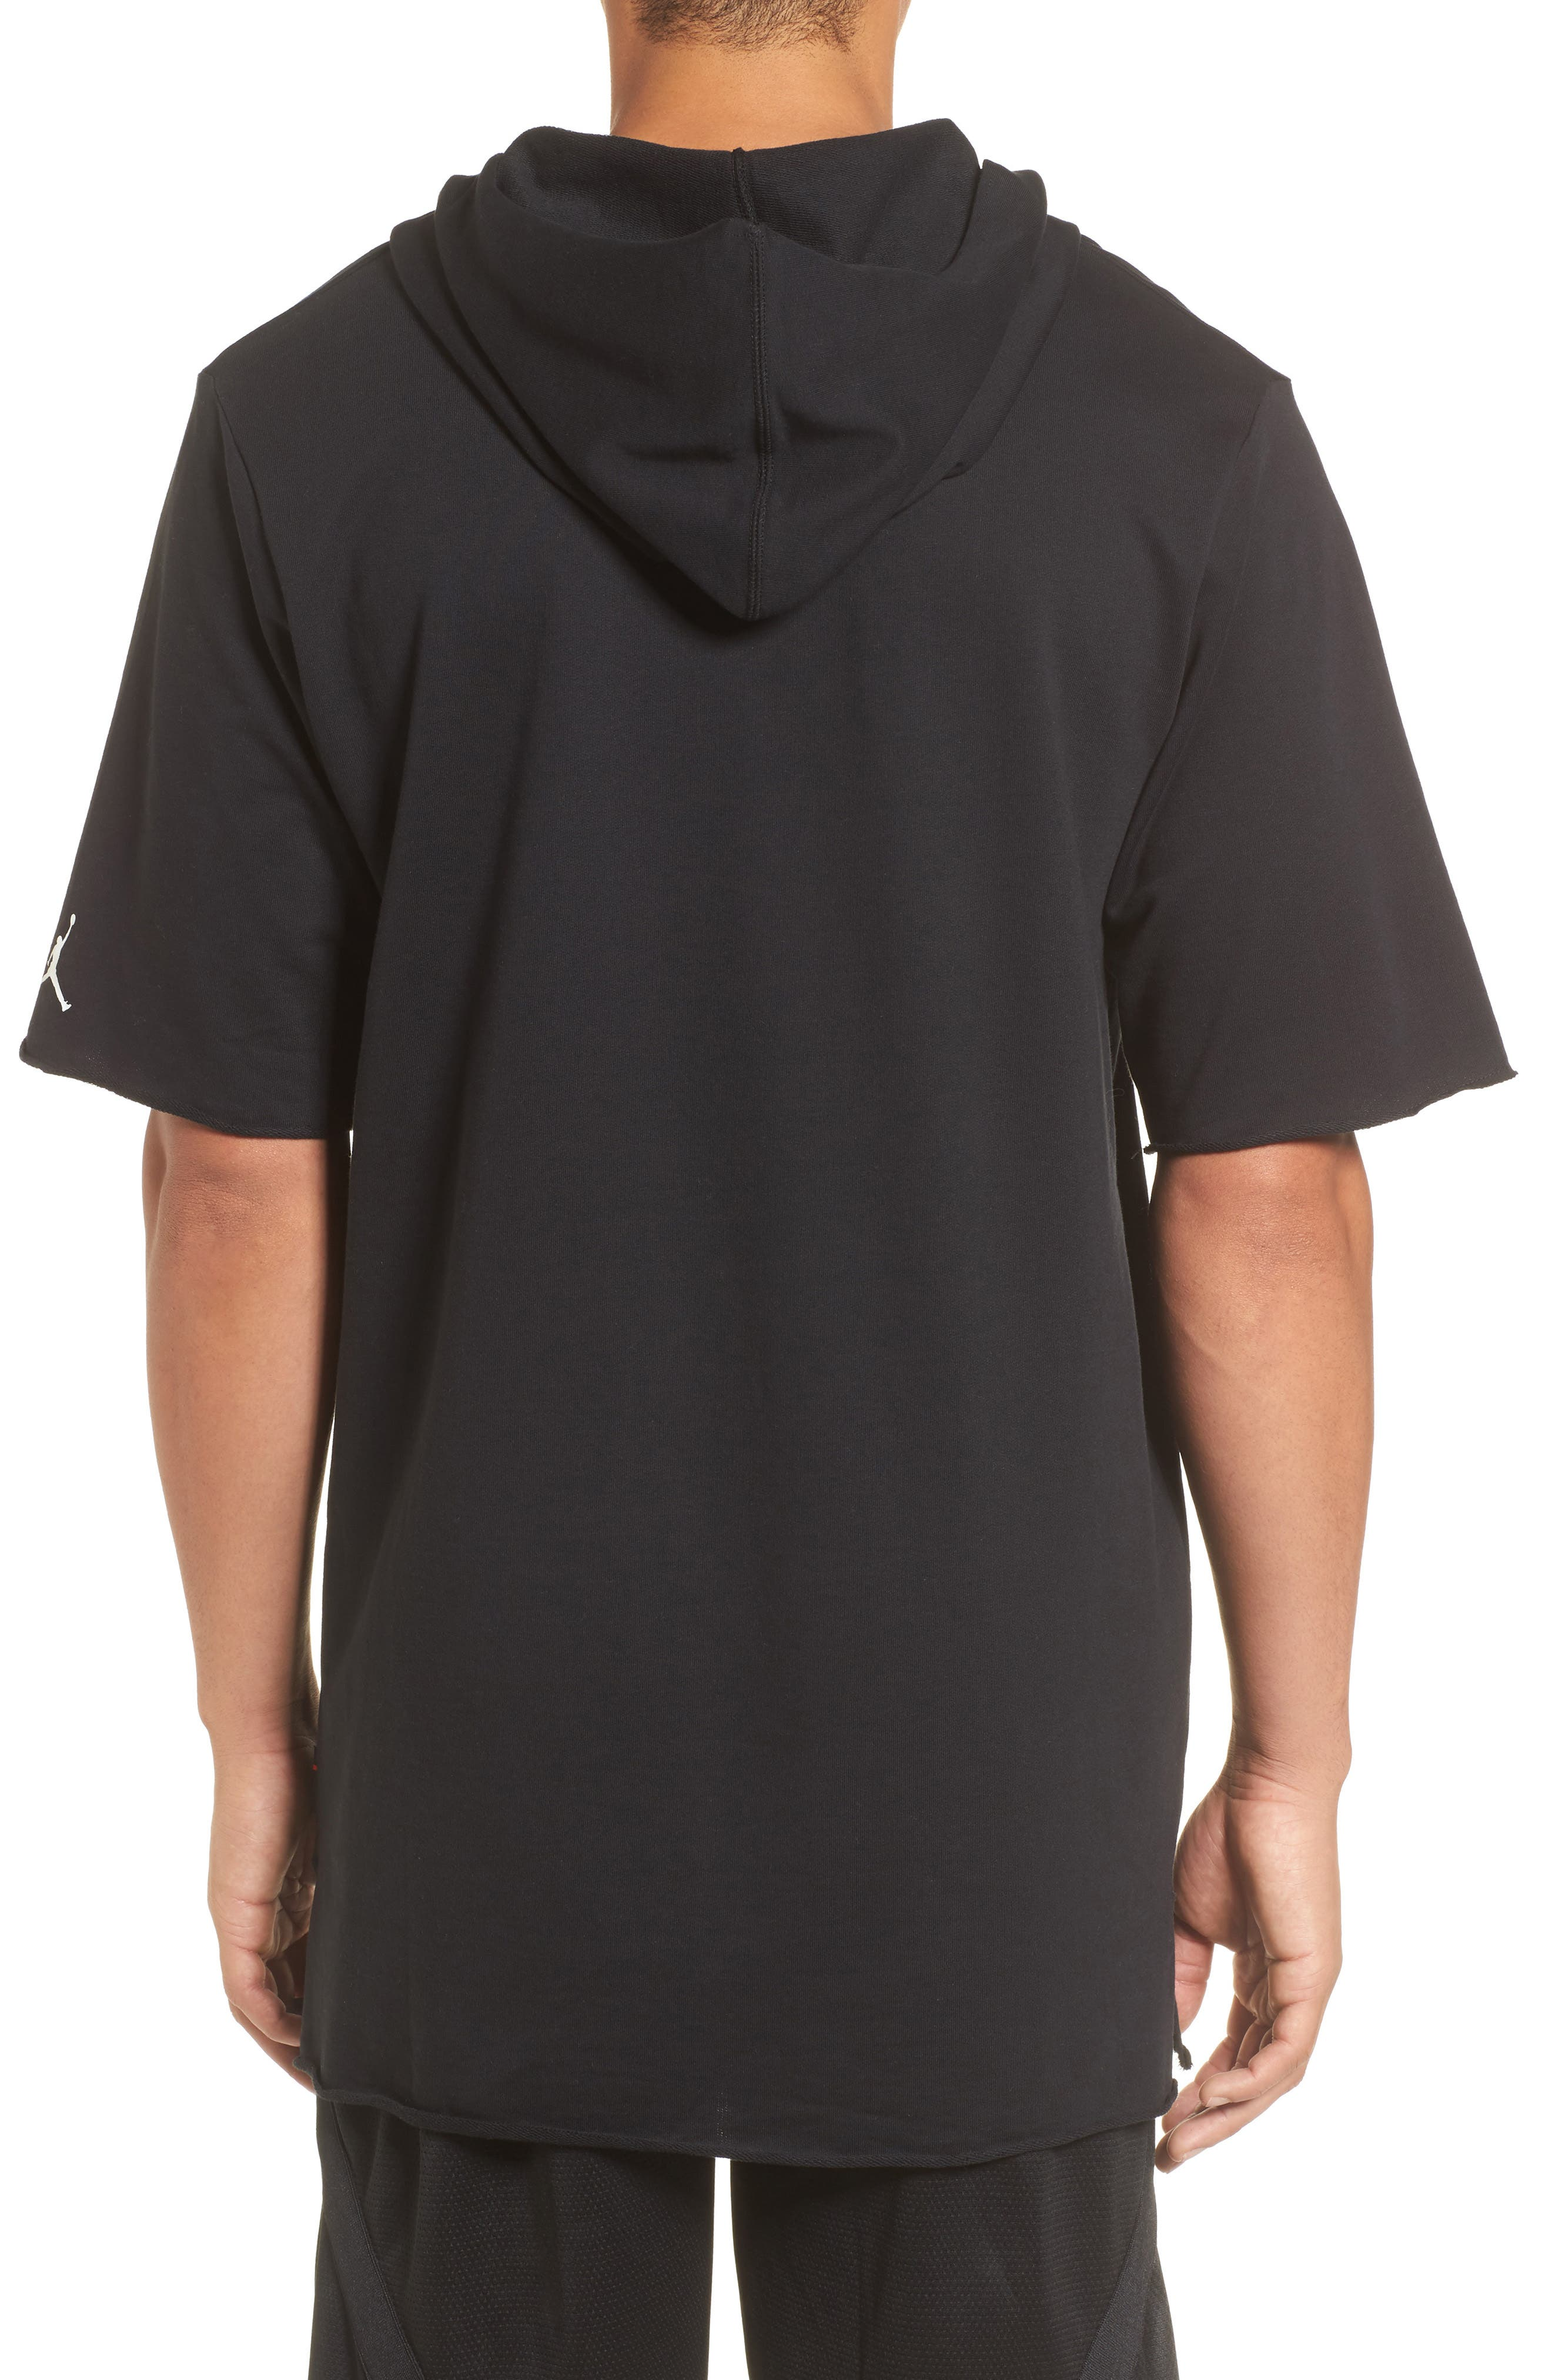 Sportswear City of Flight Hooded T-Shirt,                             Alternate thumbnail 2, color,                             010